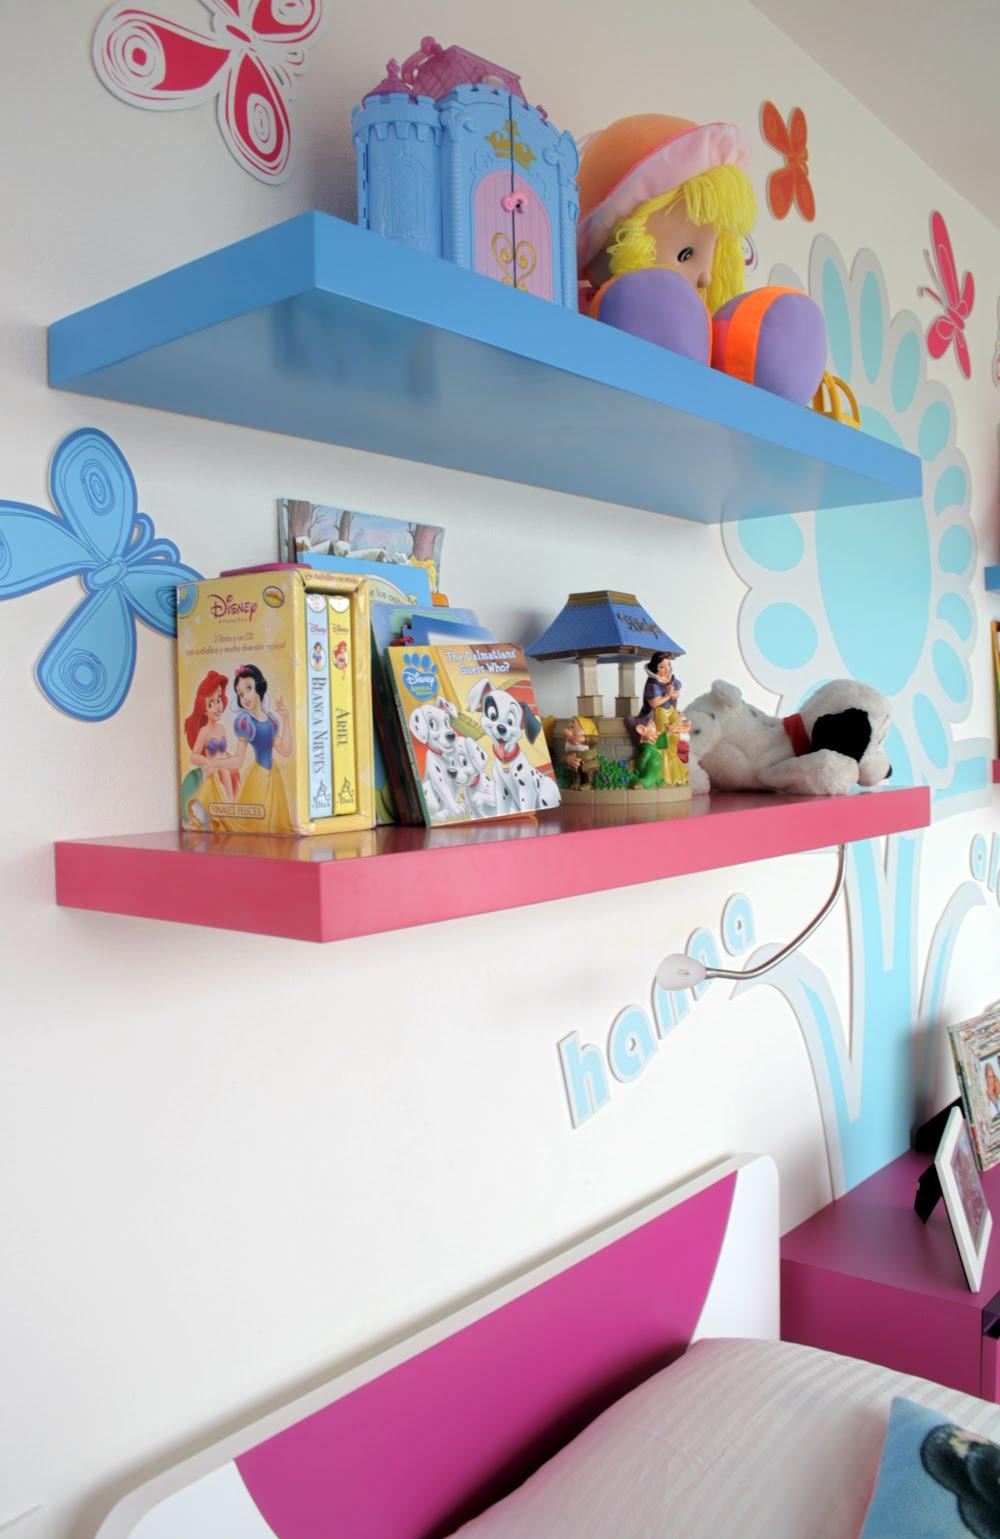 Muebles infantiles dise o dragtime for - Muebles infantiles diseno ...